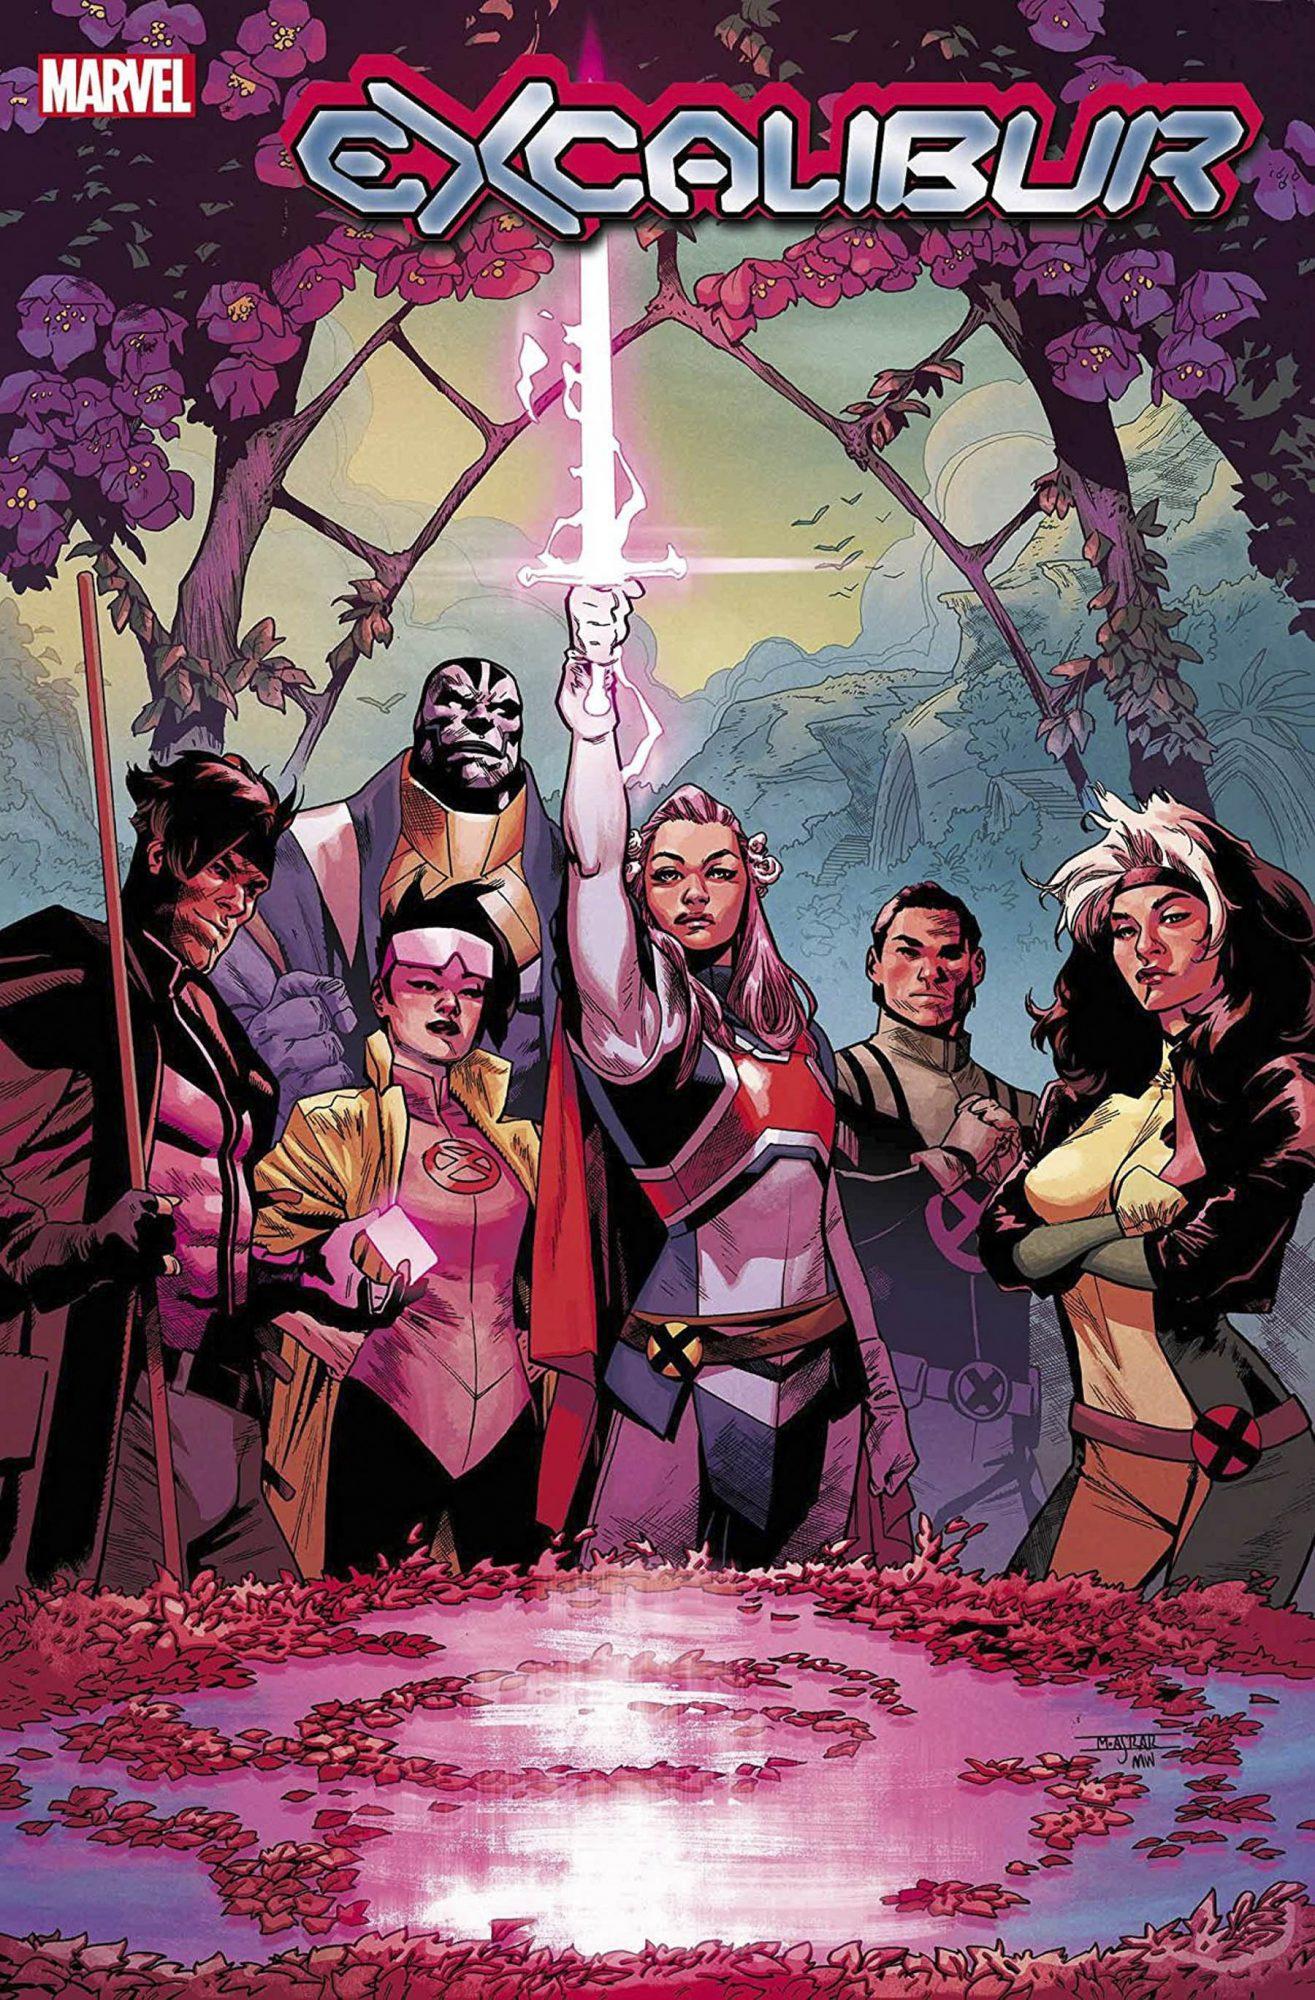 Excalibur CR: Marvel Comics